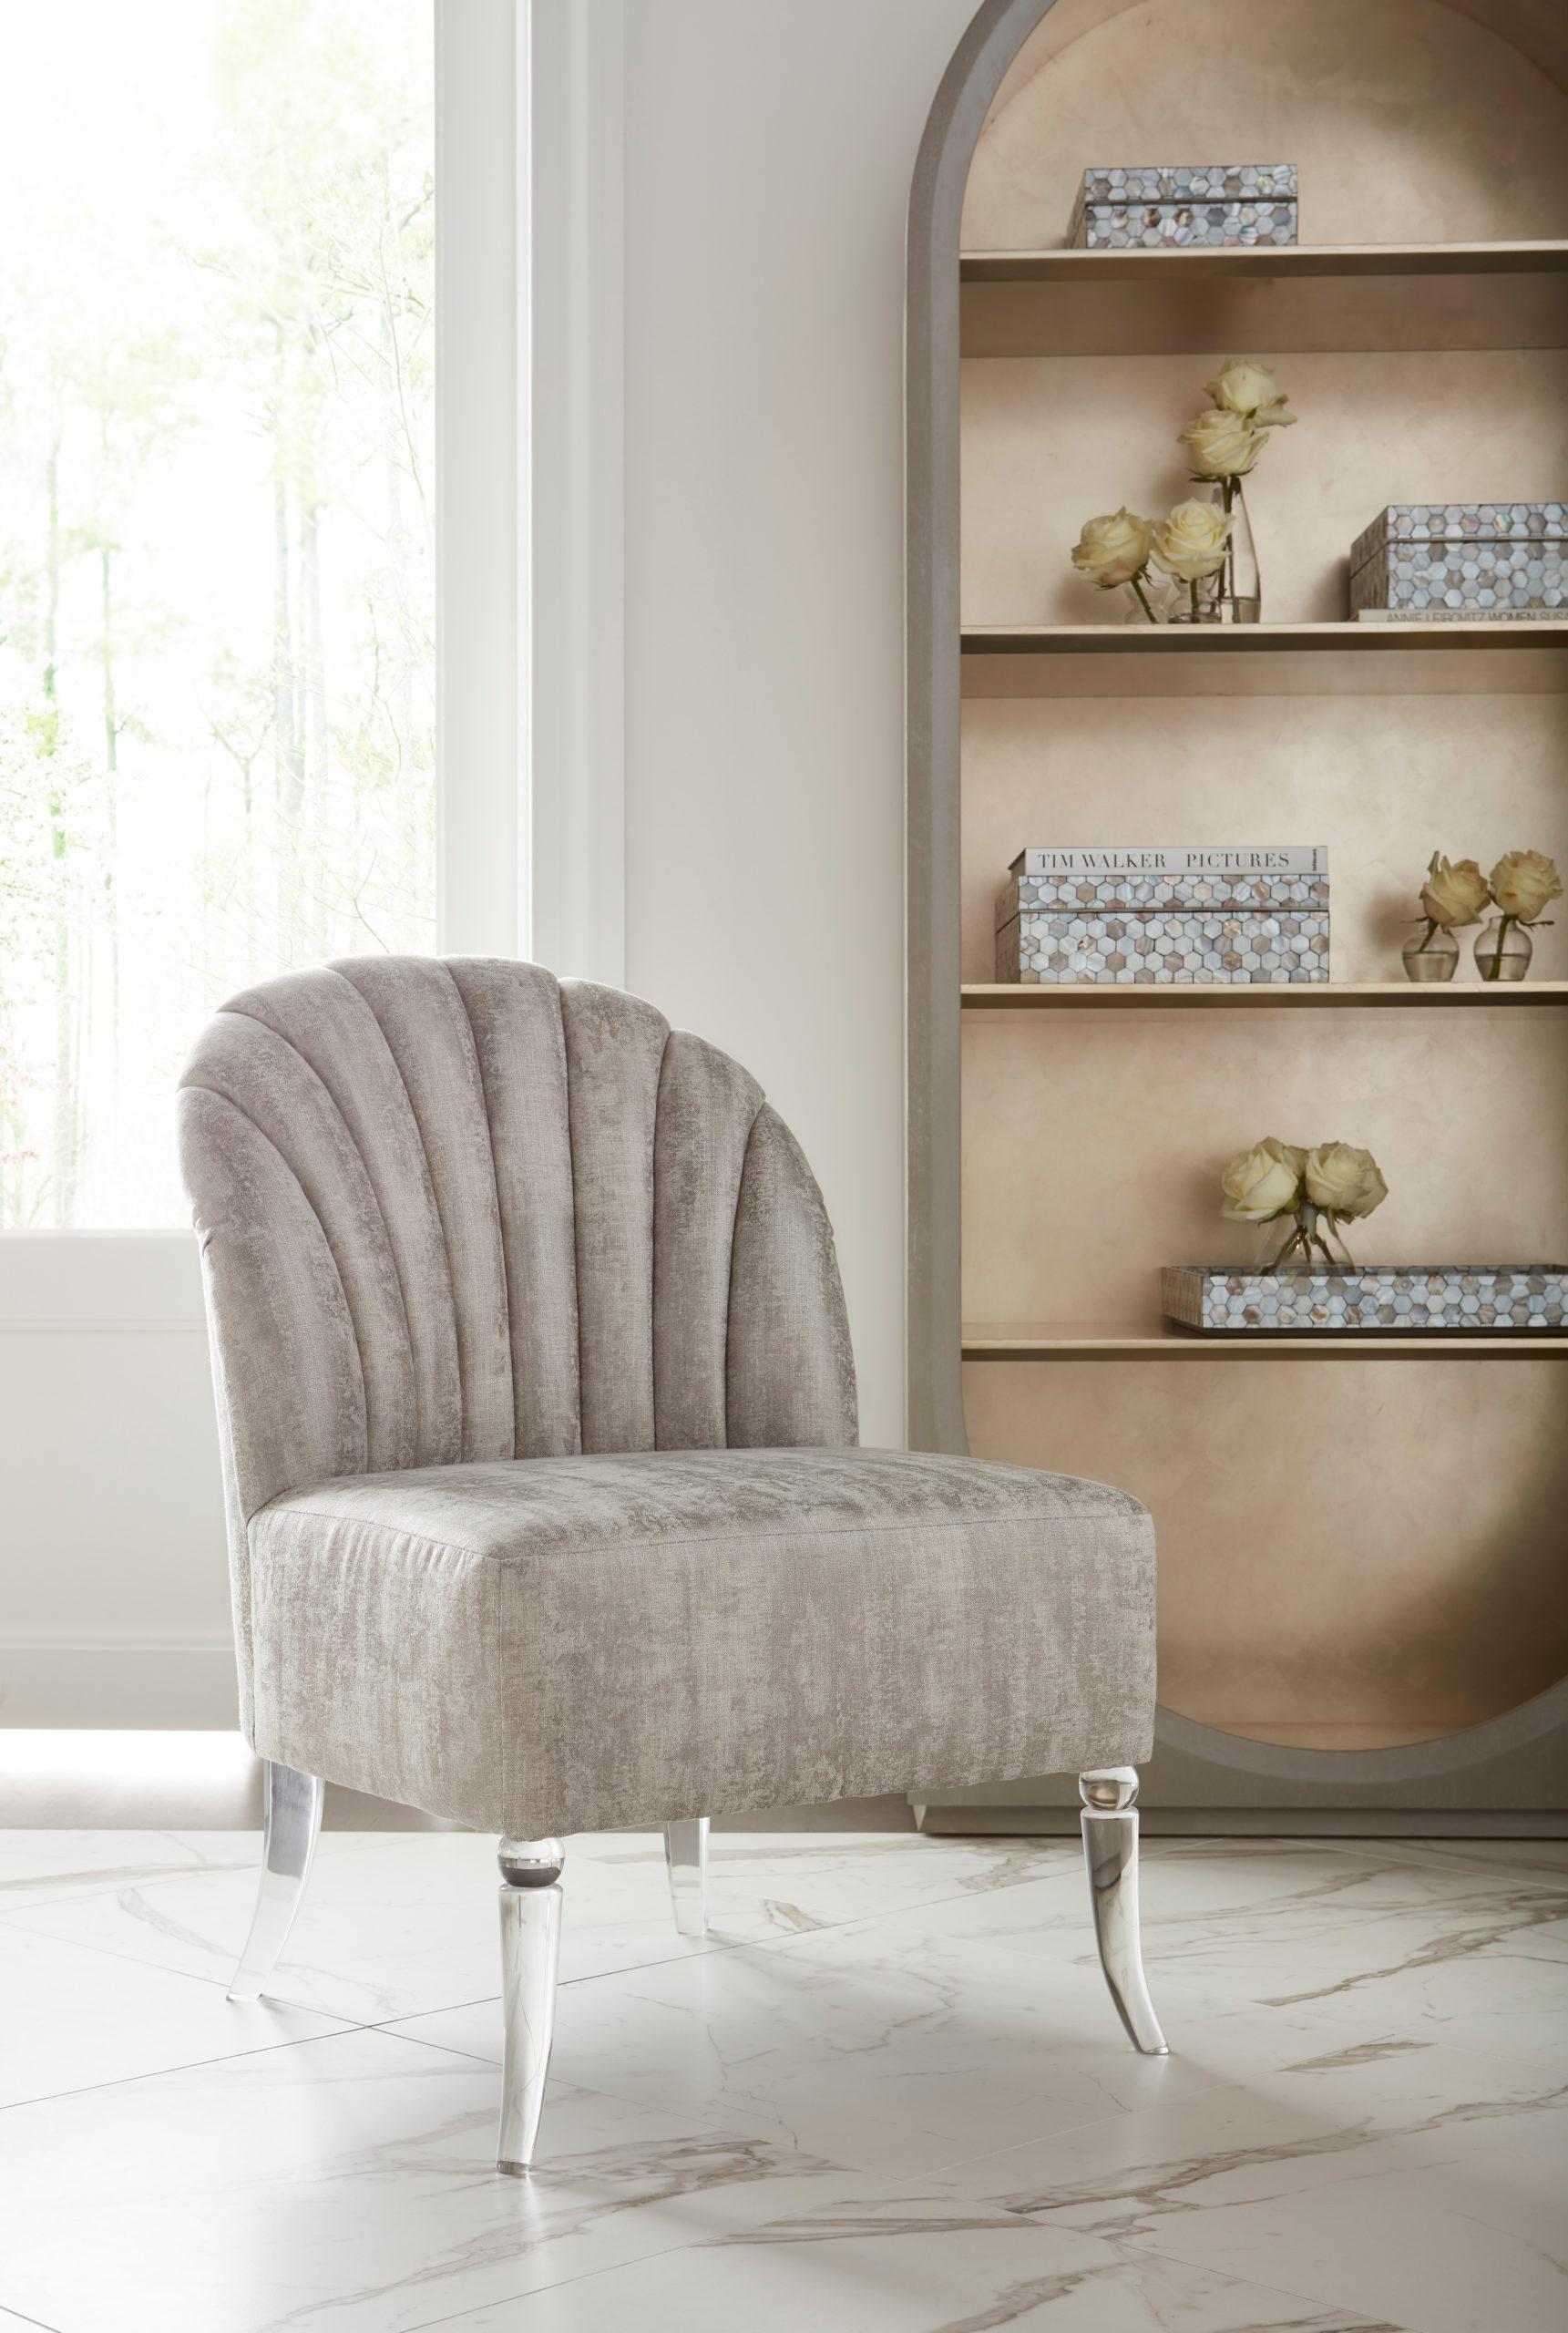 Baker_products_WNWN_lola_chair_BAU3310C_BAA3095_Detail-scaled-1